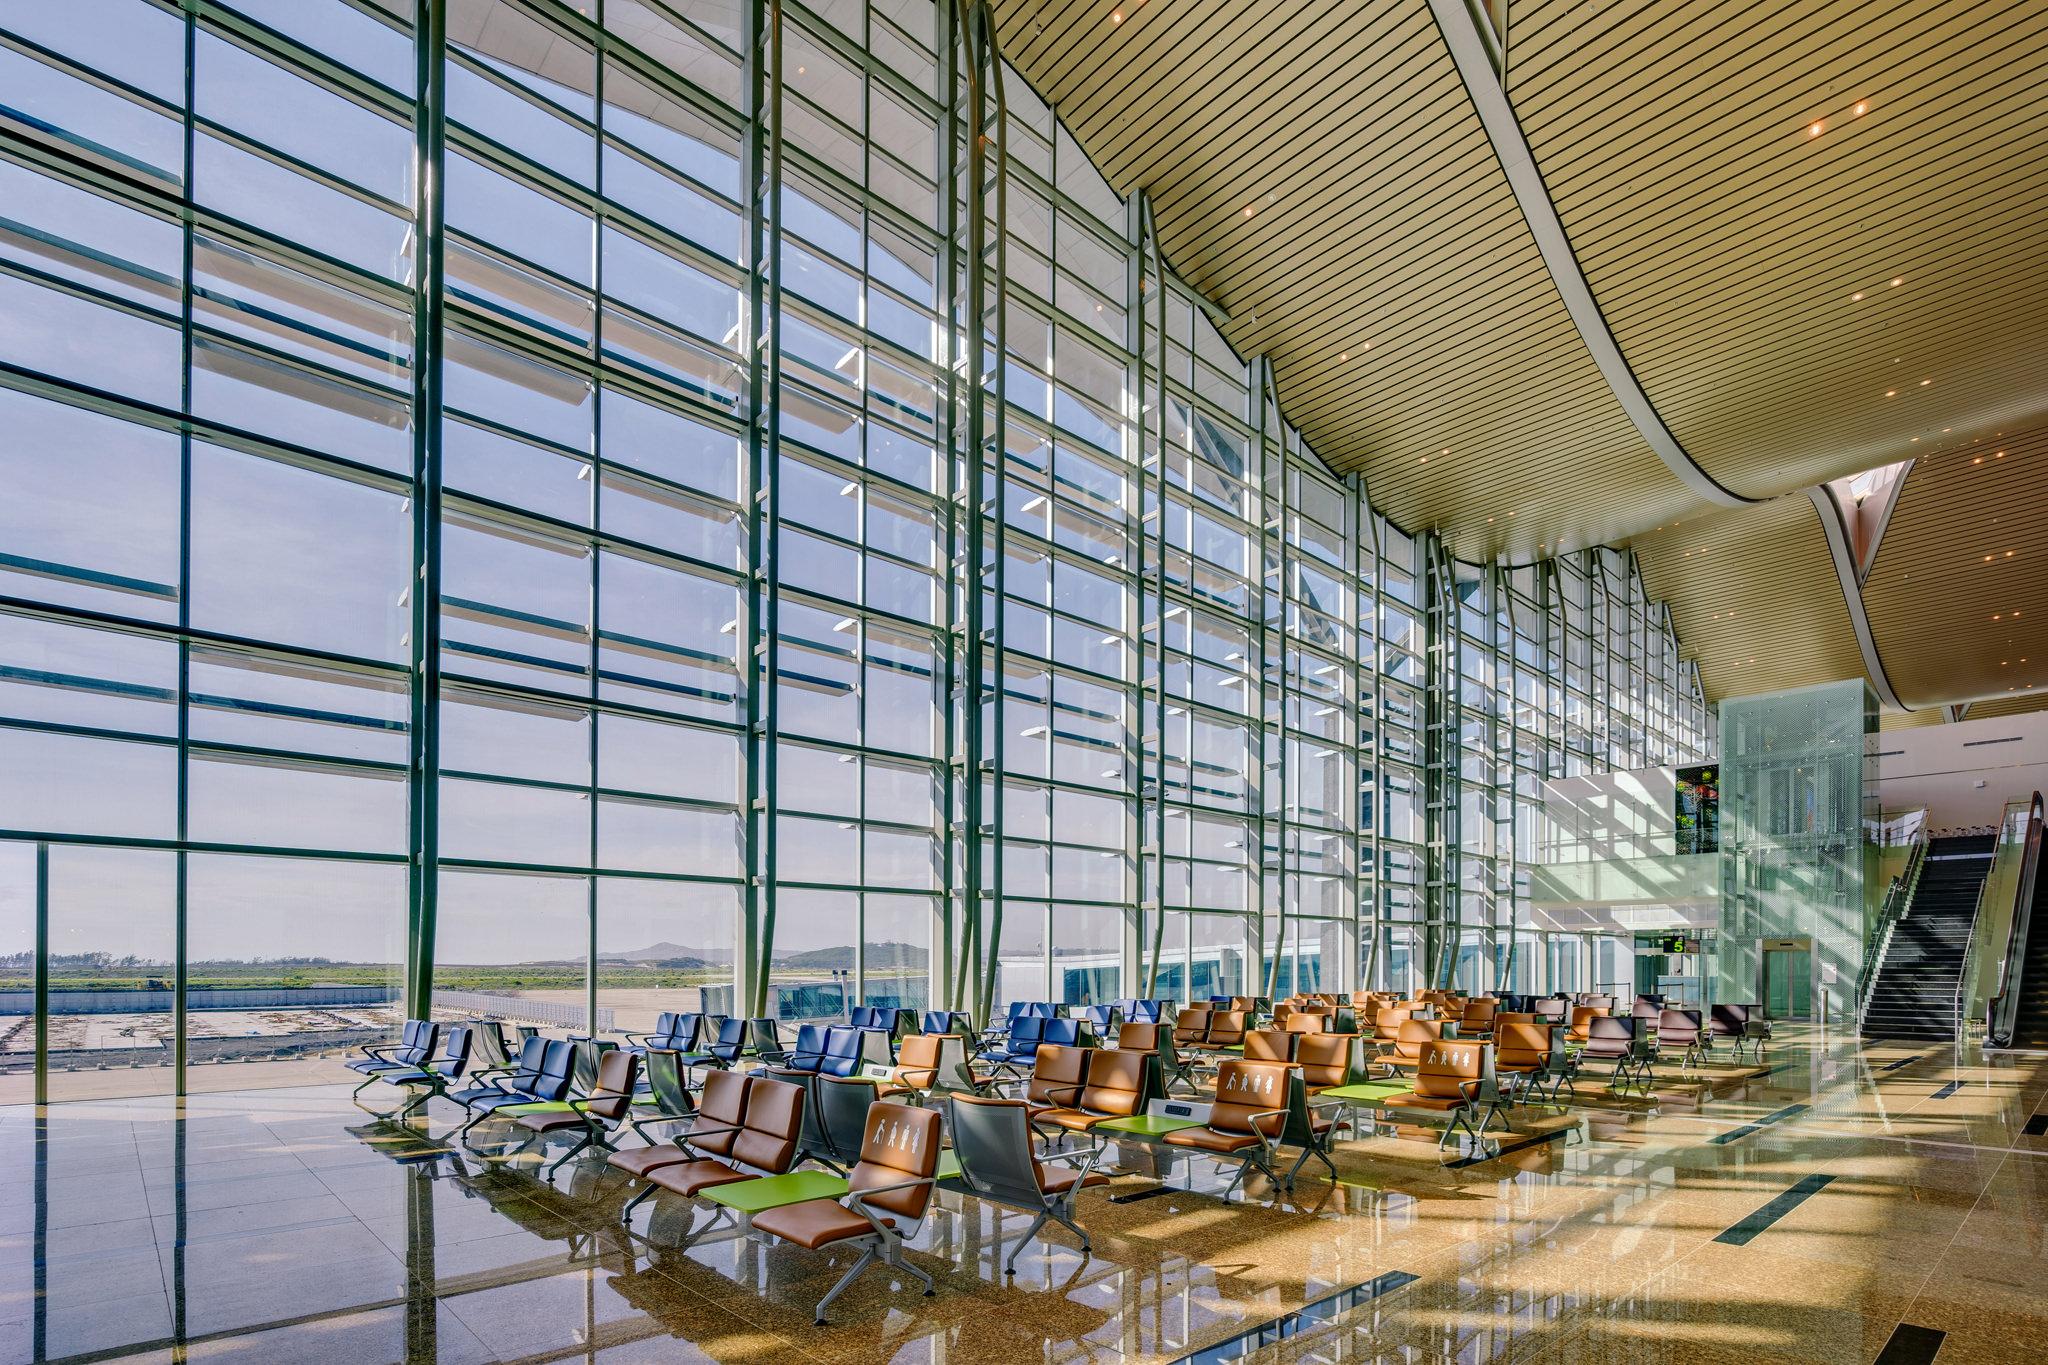 20180626 - Cam Ranh Airport - Architecture - 0192.jpg